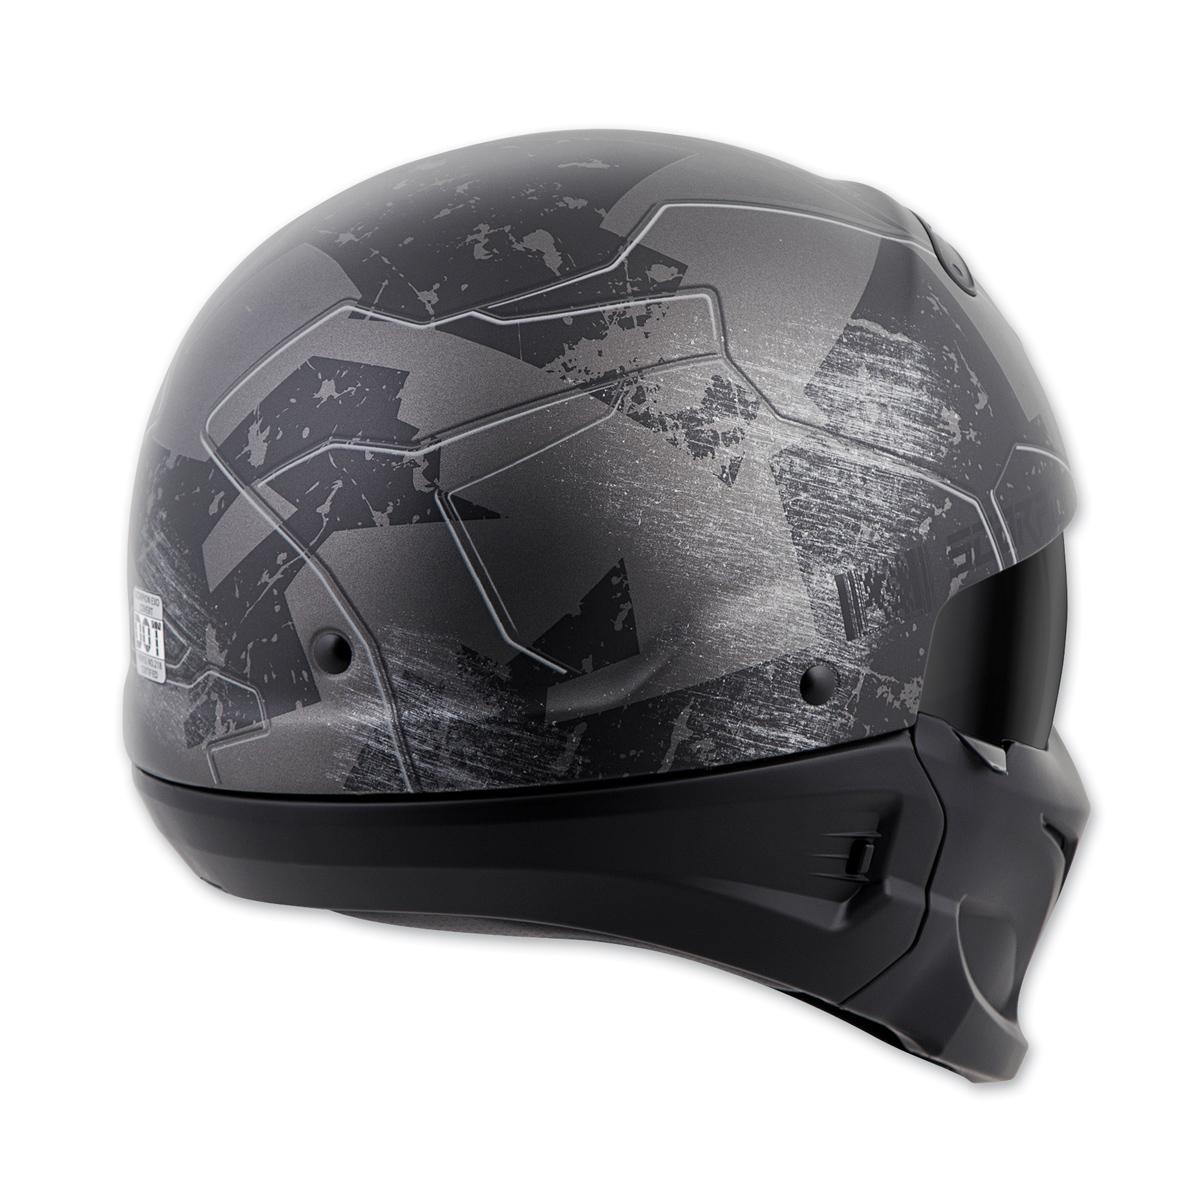 scorpion exo covert half helmet ebay. Black Bedroom Furniture Sets. Home Design Ideas